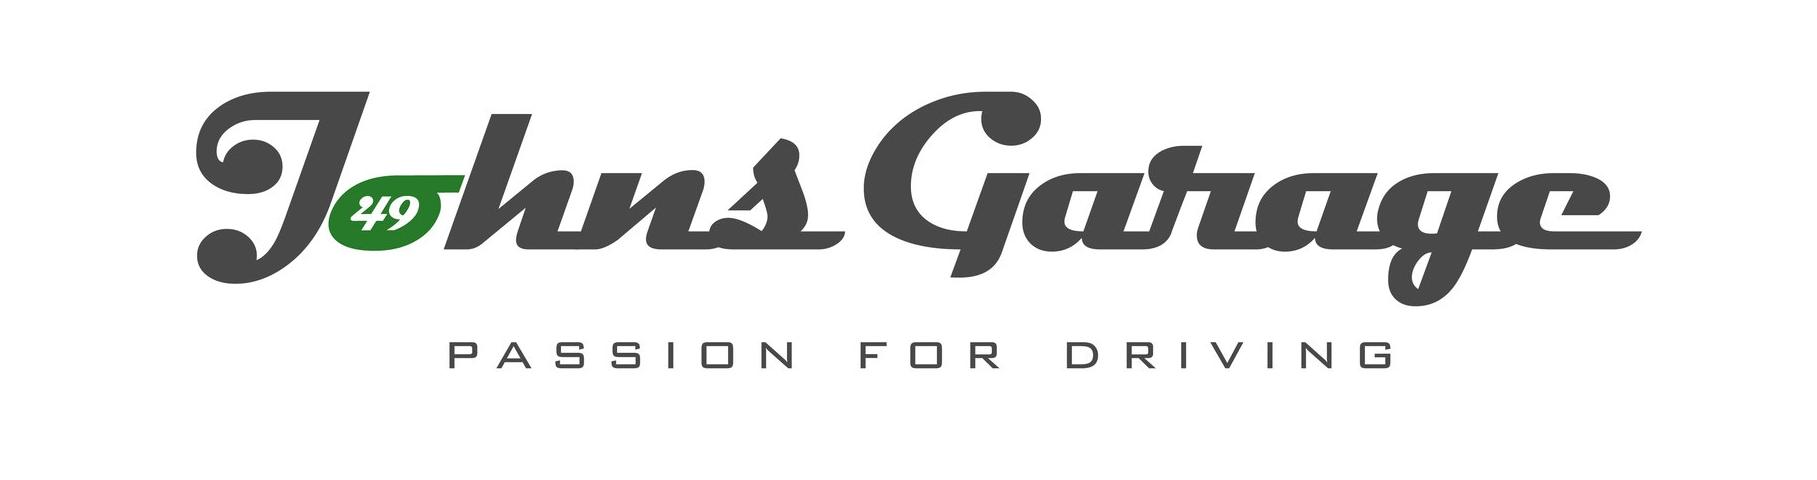 Johns Garage- in line.png